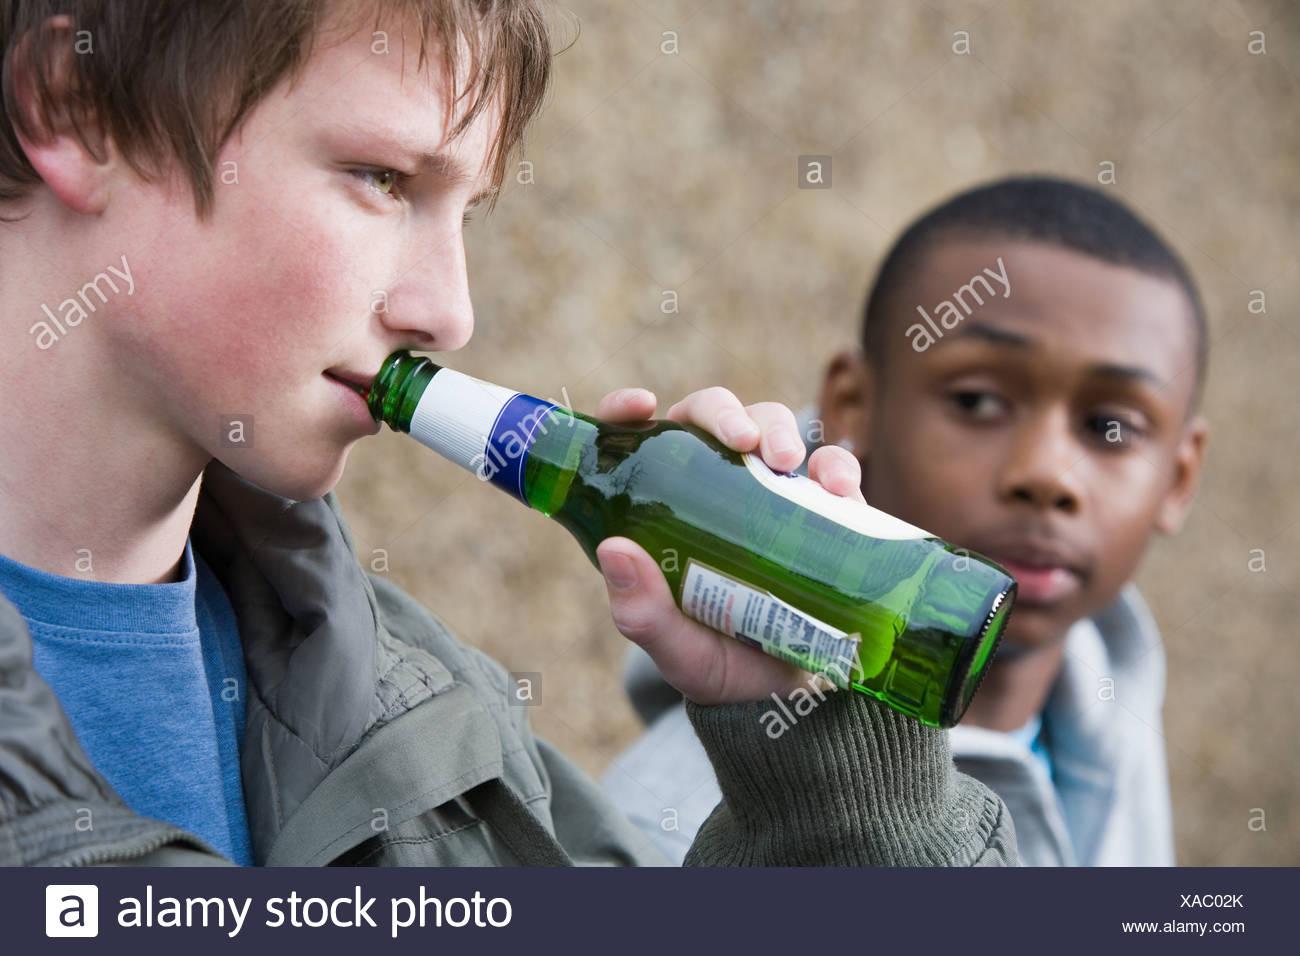 Teenagers drinking beer - Stock Image